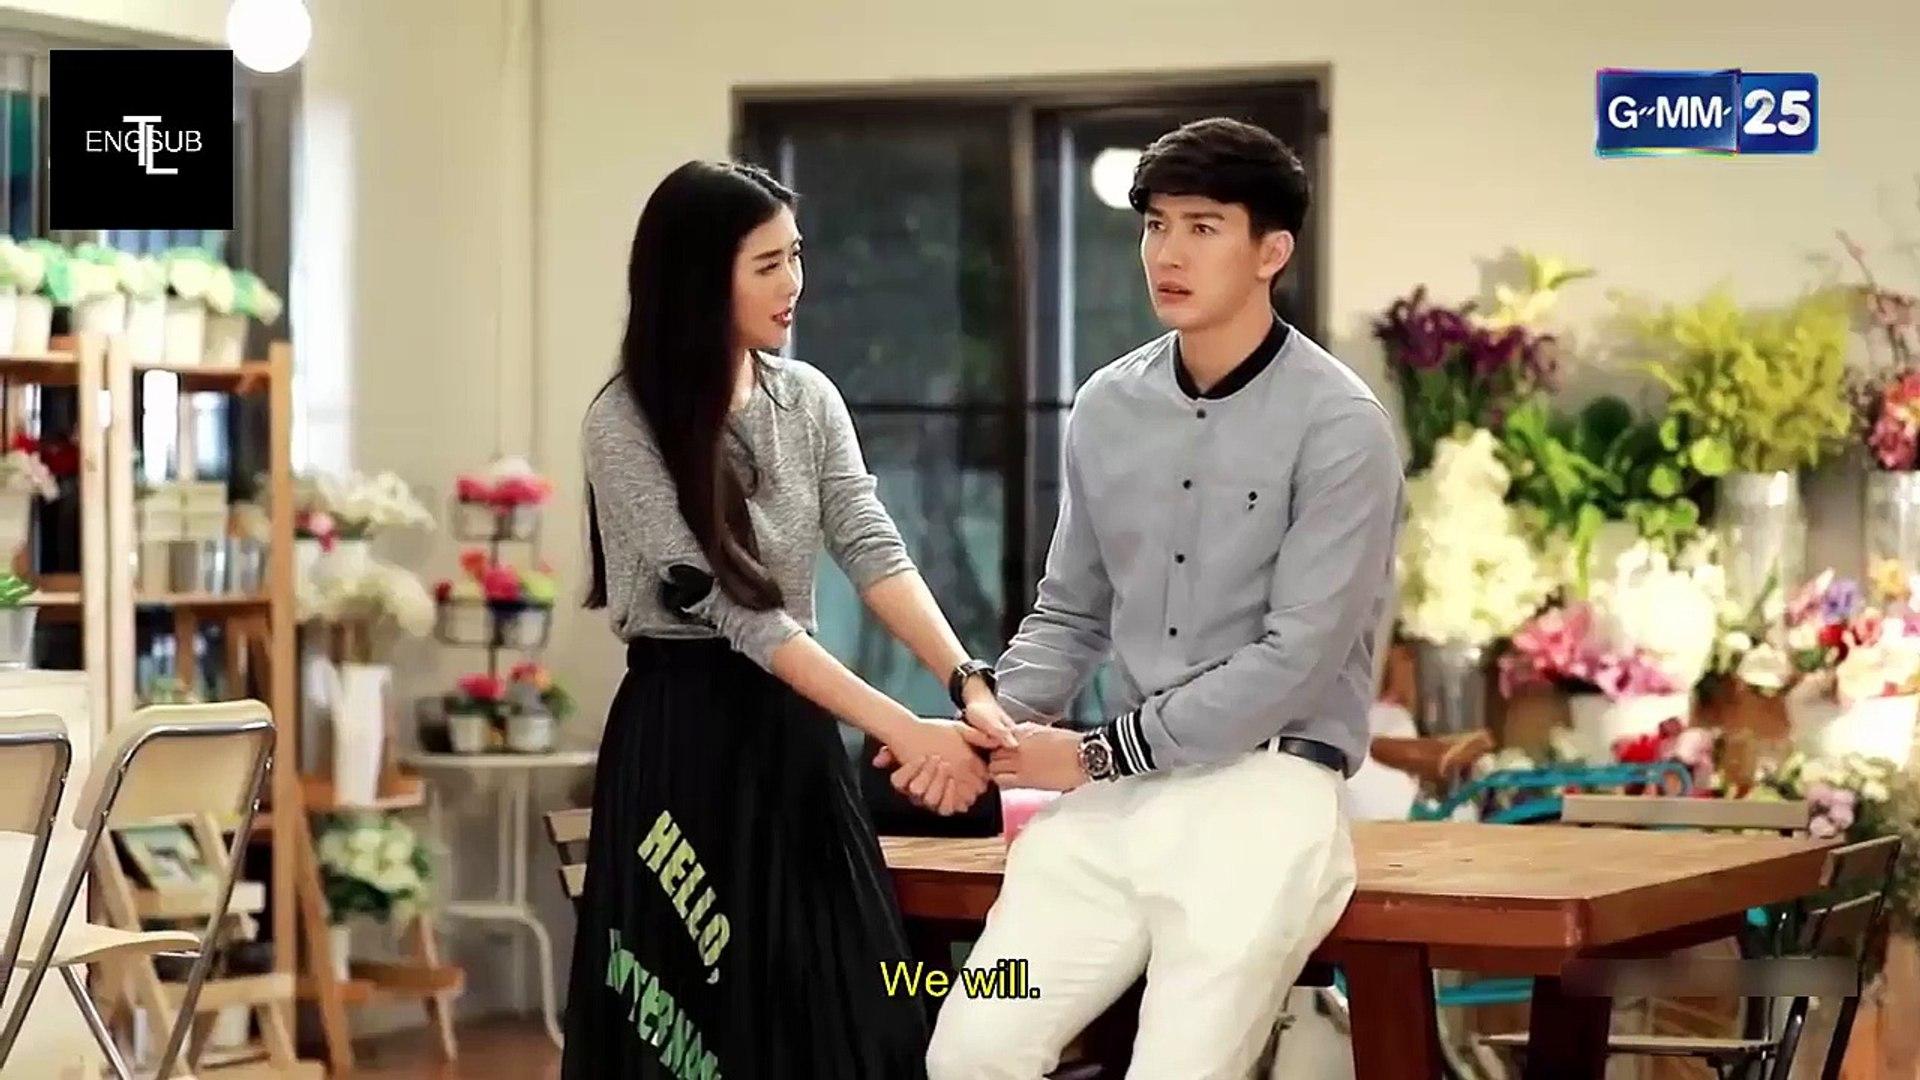 [ENG SUB] Waen Dok Mai EP 32, 23 Eng Sub | Flower Ring Thai Drama EP 32, 23  Eng Sub | แหวนดอกไม้ EP 23 | Will You Marry Me EP 23 Eng Sub